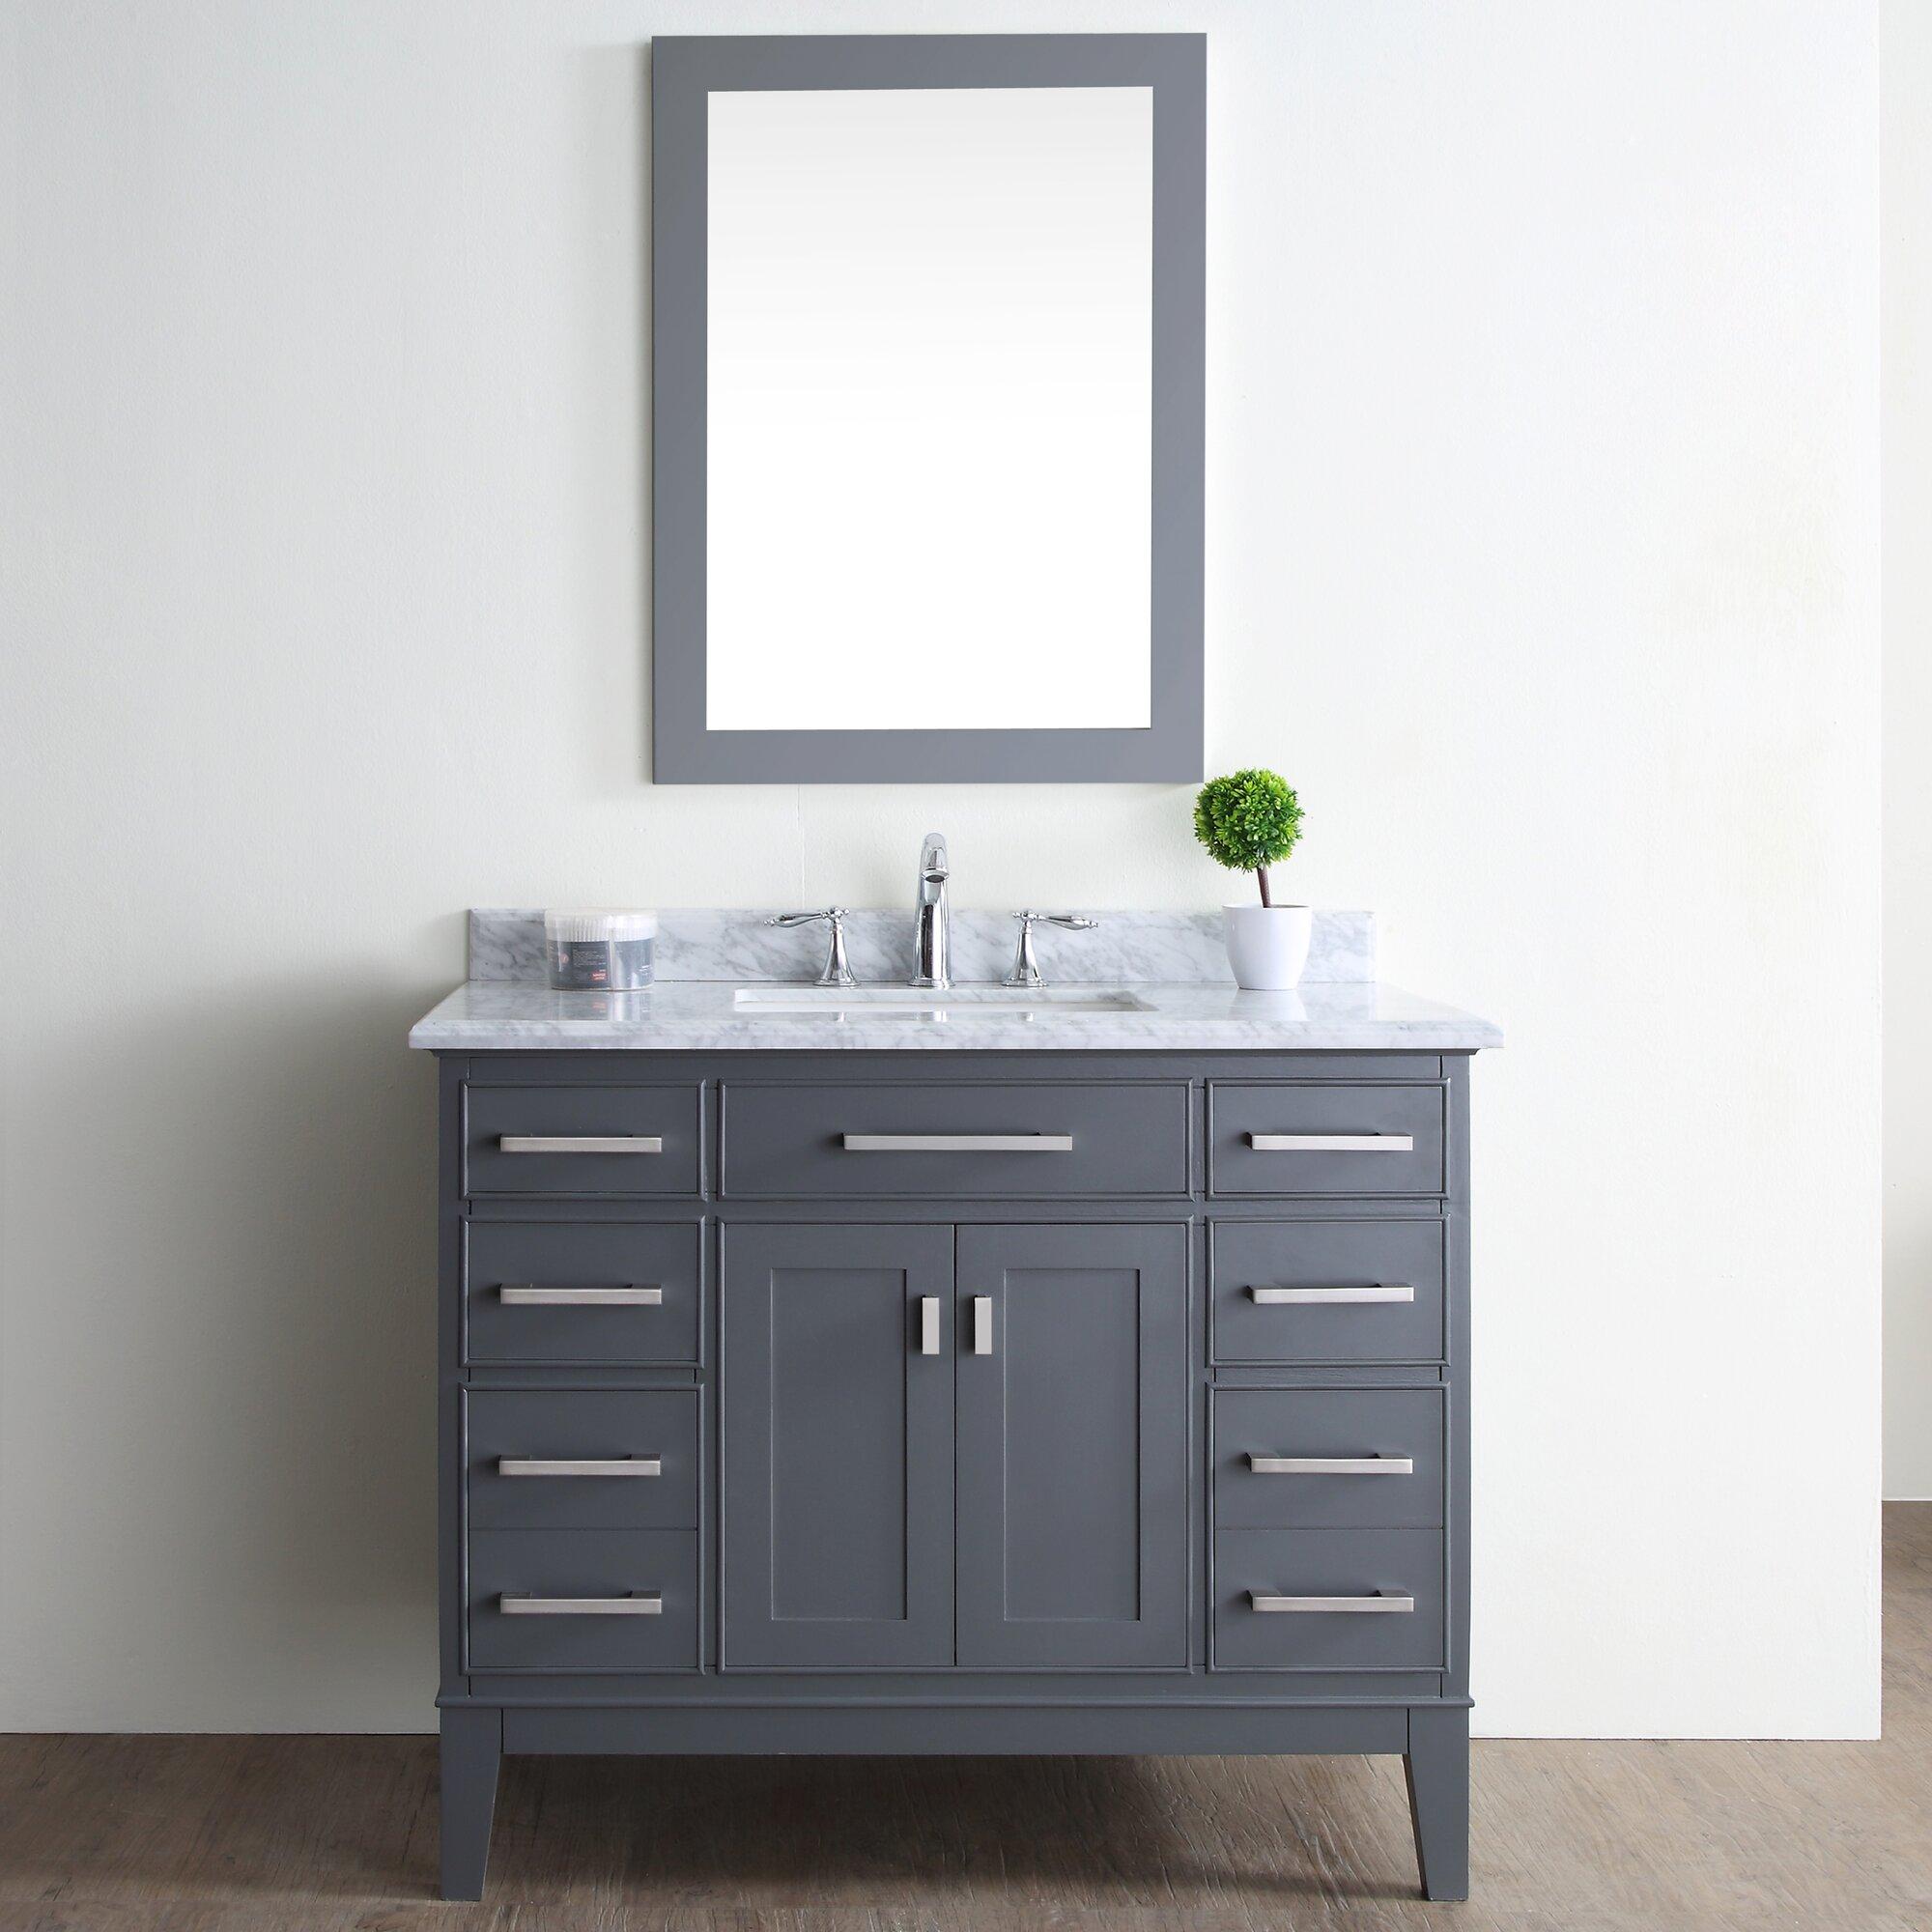 Ari Kitchen Bath Danny 42 Single Bathroom Vanity Set Reviews Wayfair